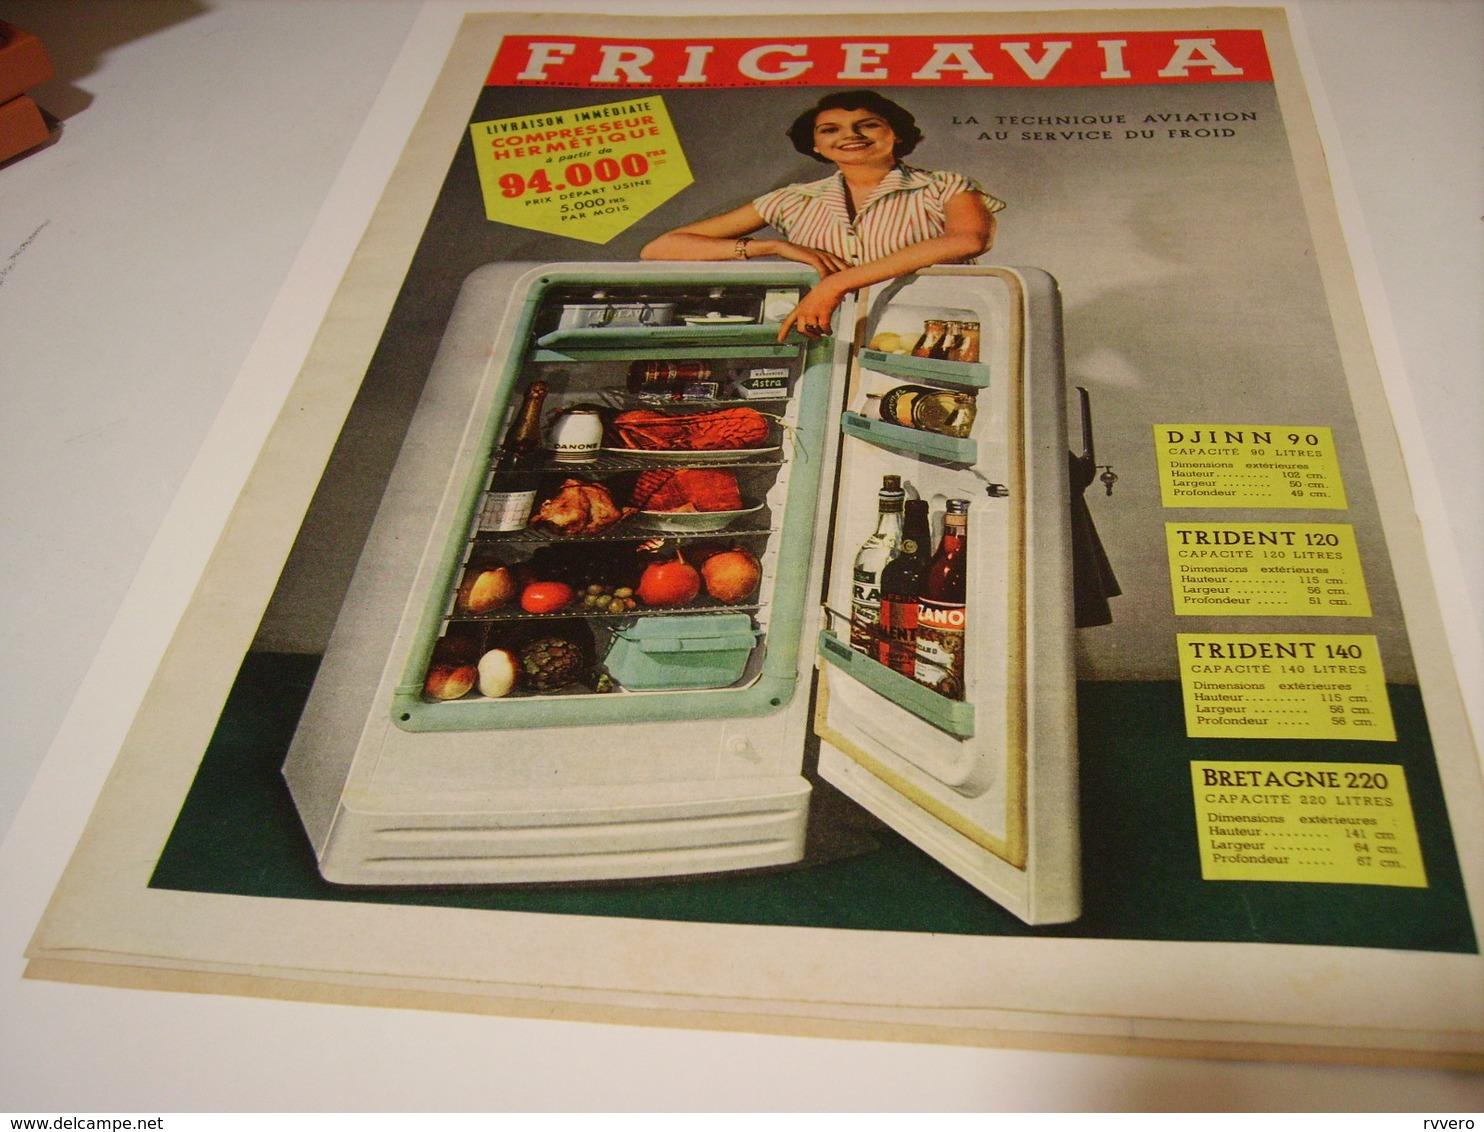 ANCIENNE AFFICHE PUBLICITE FRIGO FRIGEAVIA 1955 - Pubblicitari